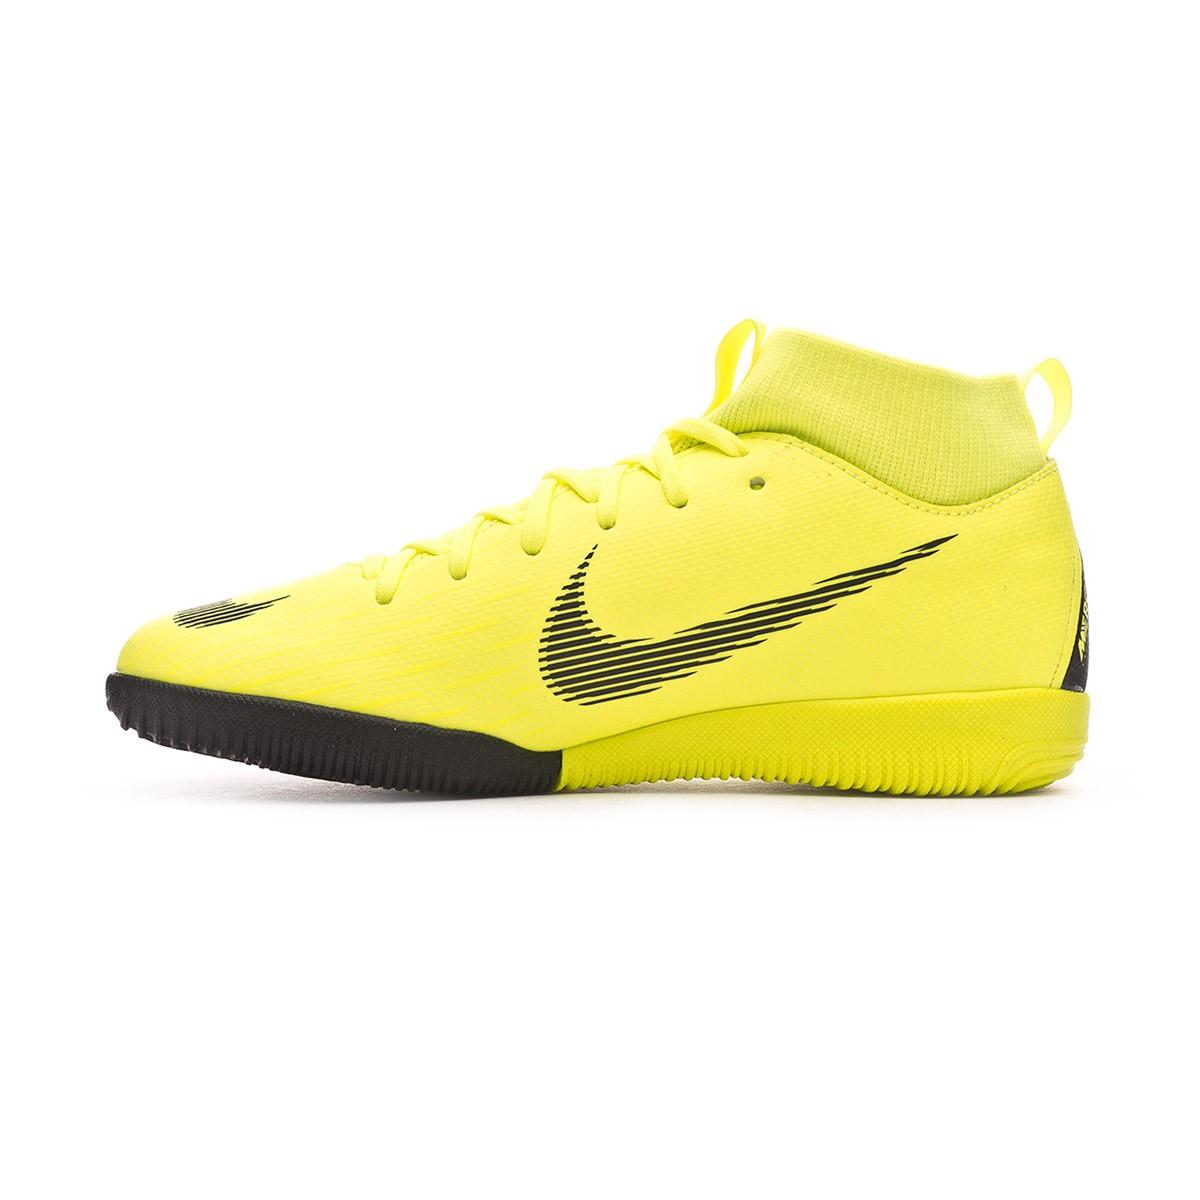 e6870b057dd Futsal Boot Nike Kids Mercurial SuperflyX VI Academy IC Volt-Black -  Football store Fútbol Emotion